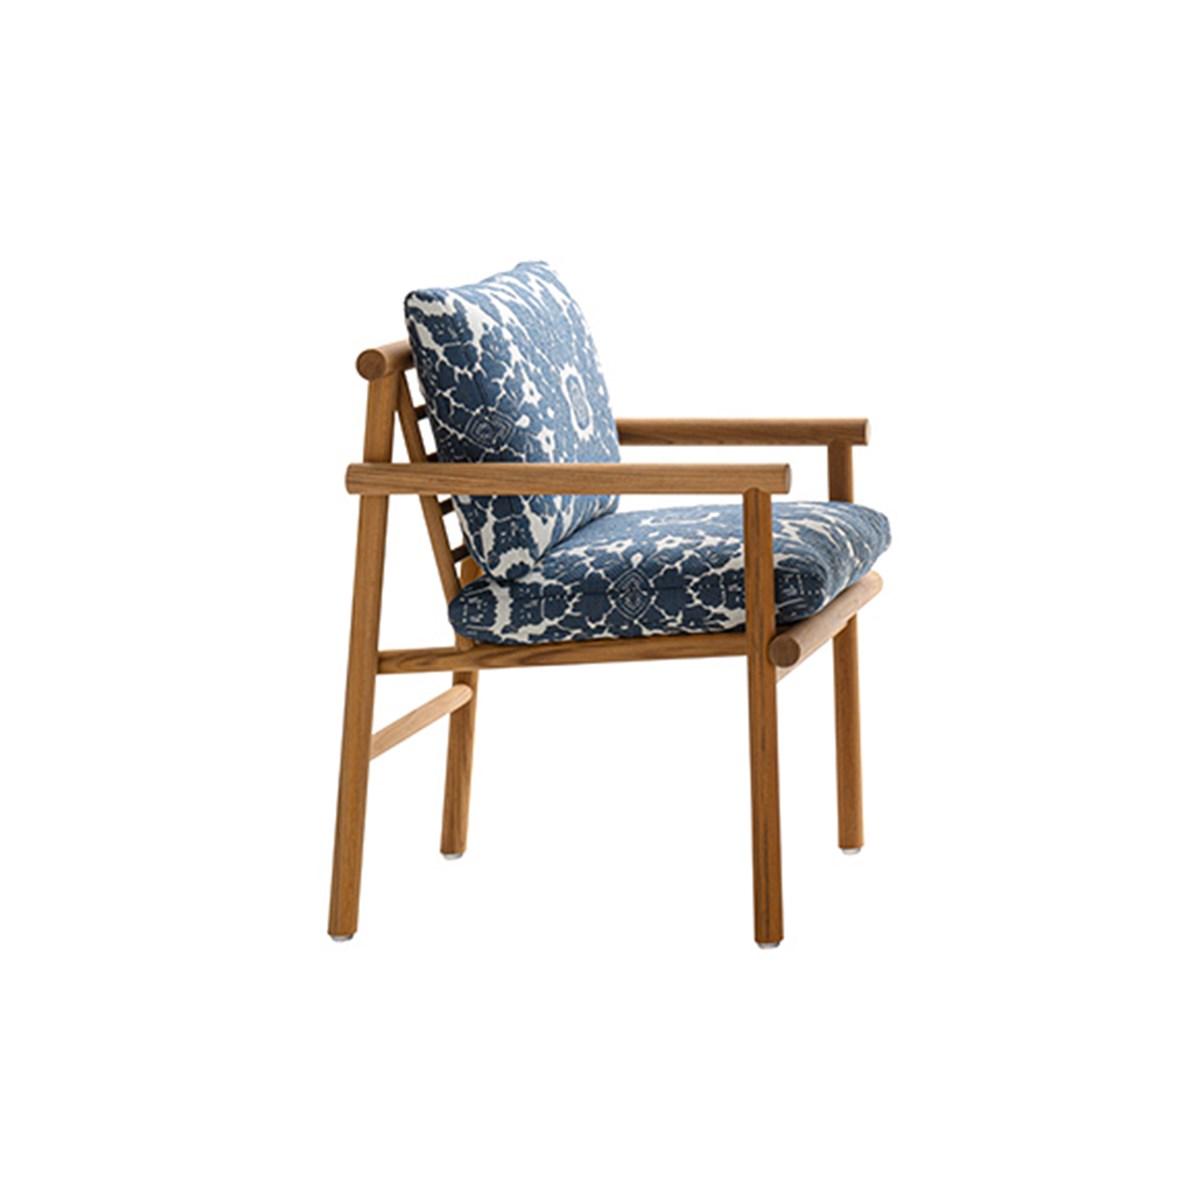 B&B-Italia-Naoto-Fukasawa-Ayana-Armchair-Matisse-1